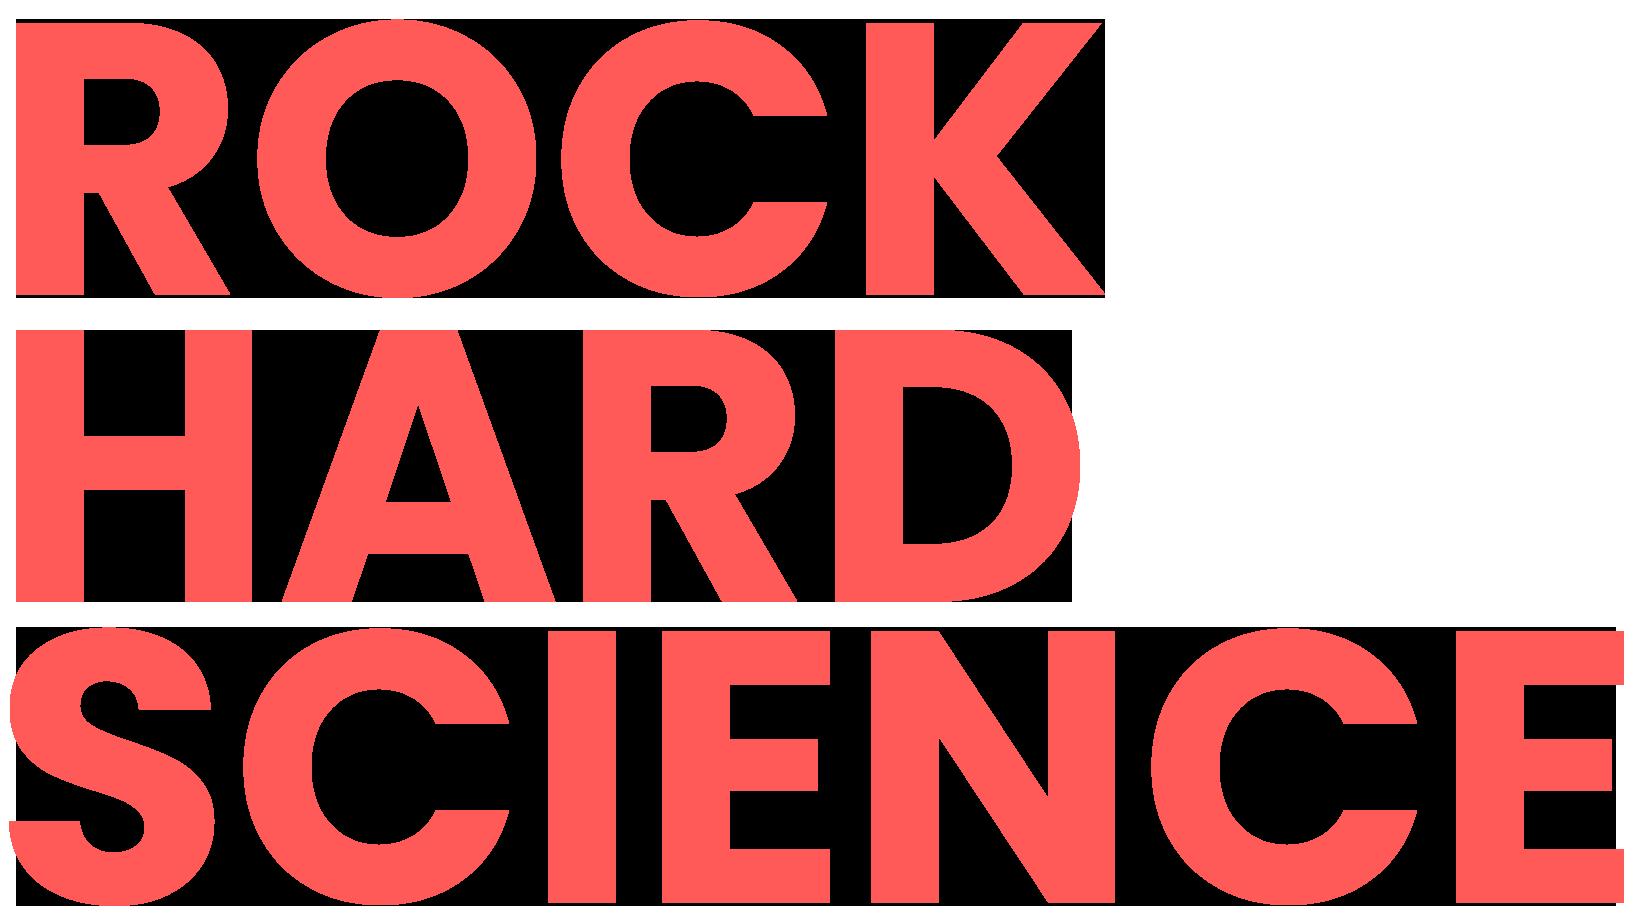 Rock Hard Science